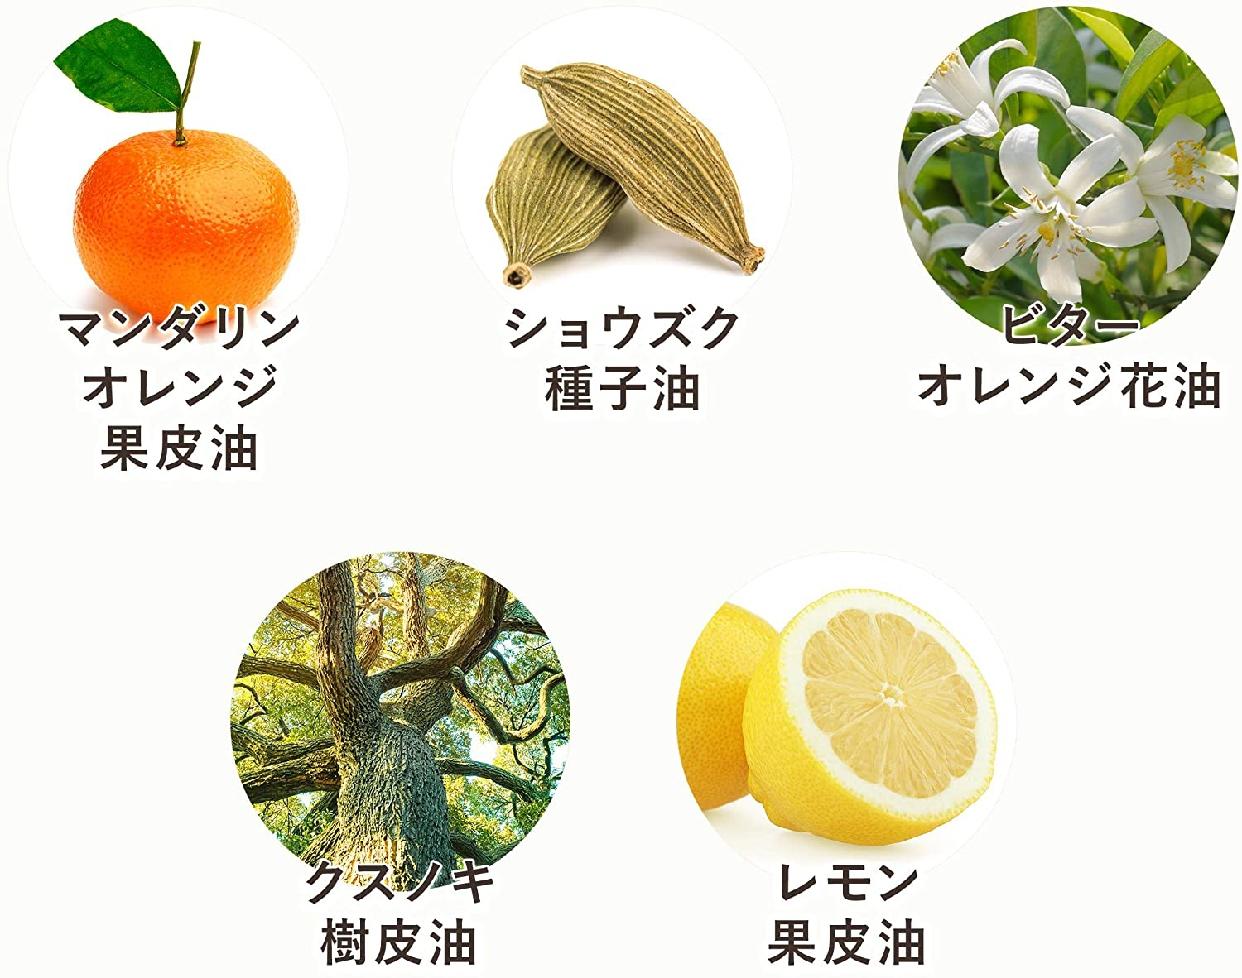 N organic(エヌオーガニック) モイスチュア&バランシング フォームの商品画像4